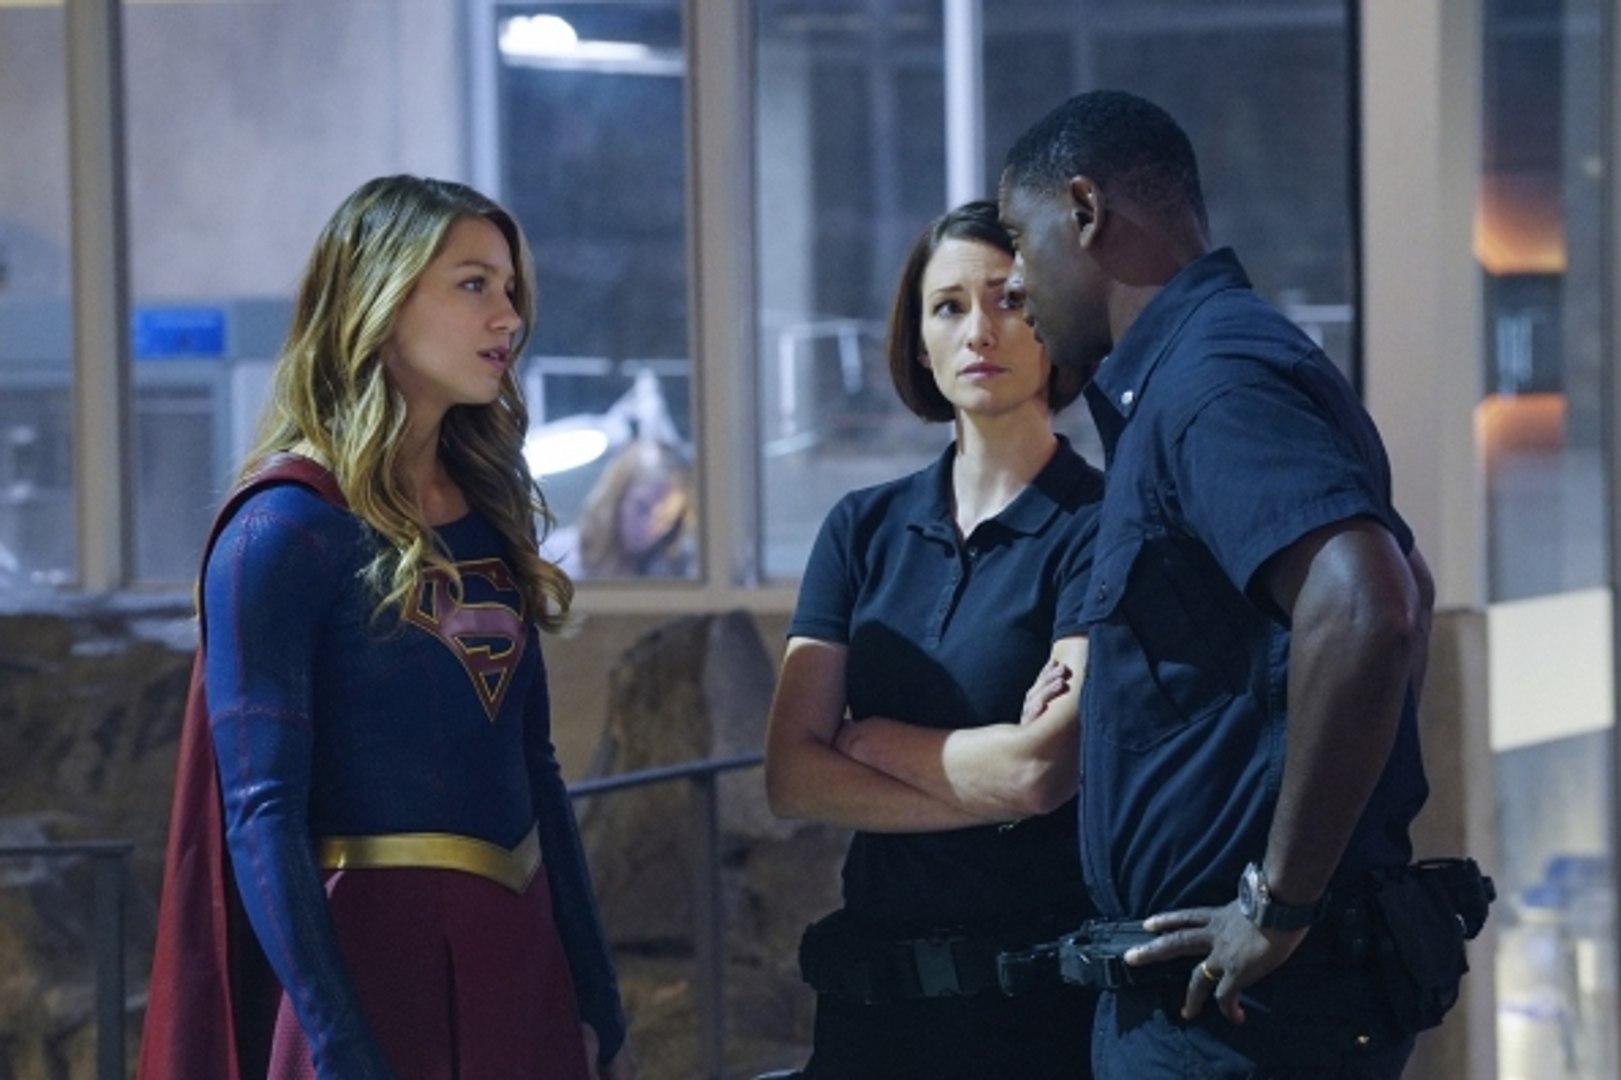 Supergirl Season 1 Episode 9